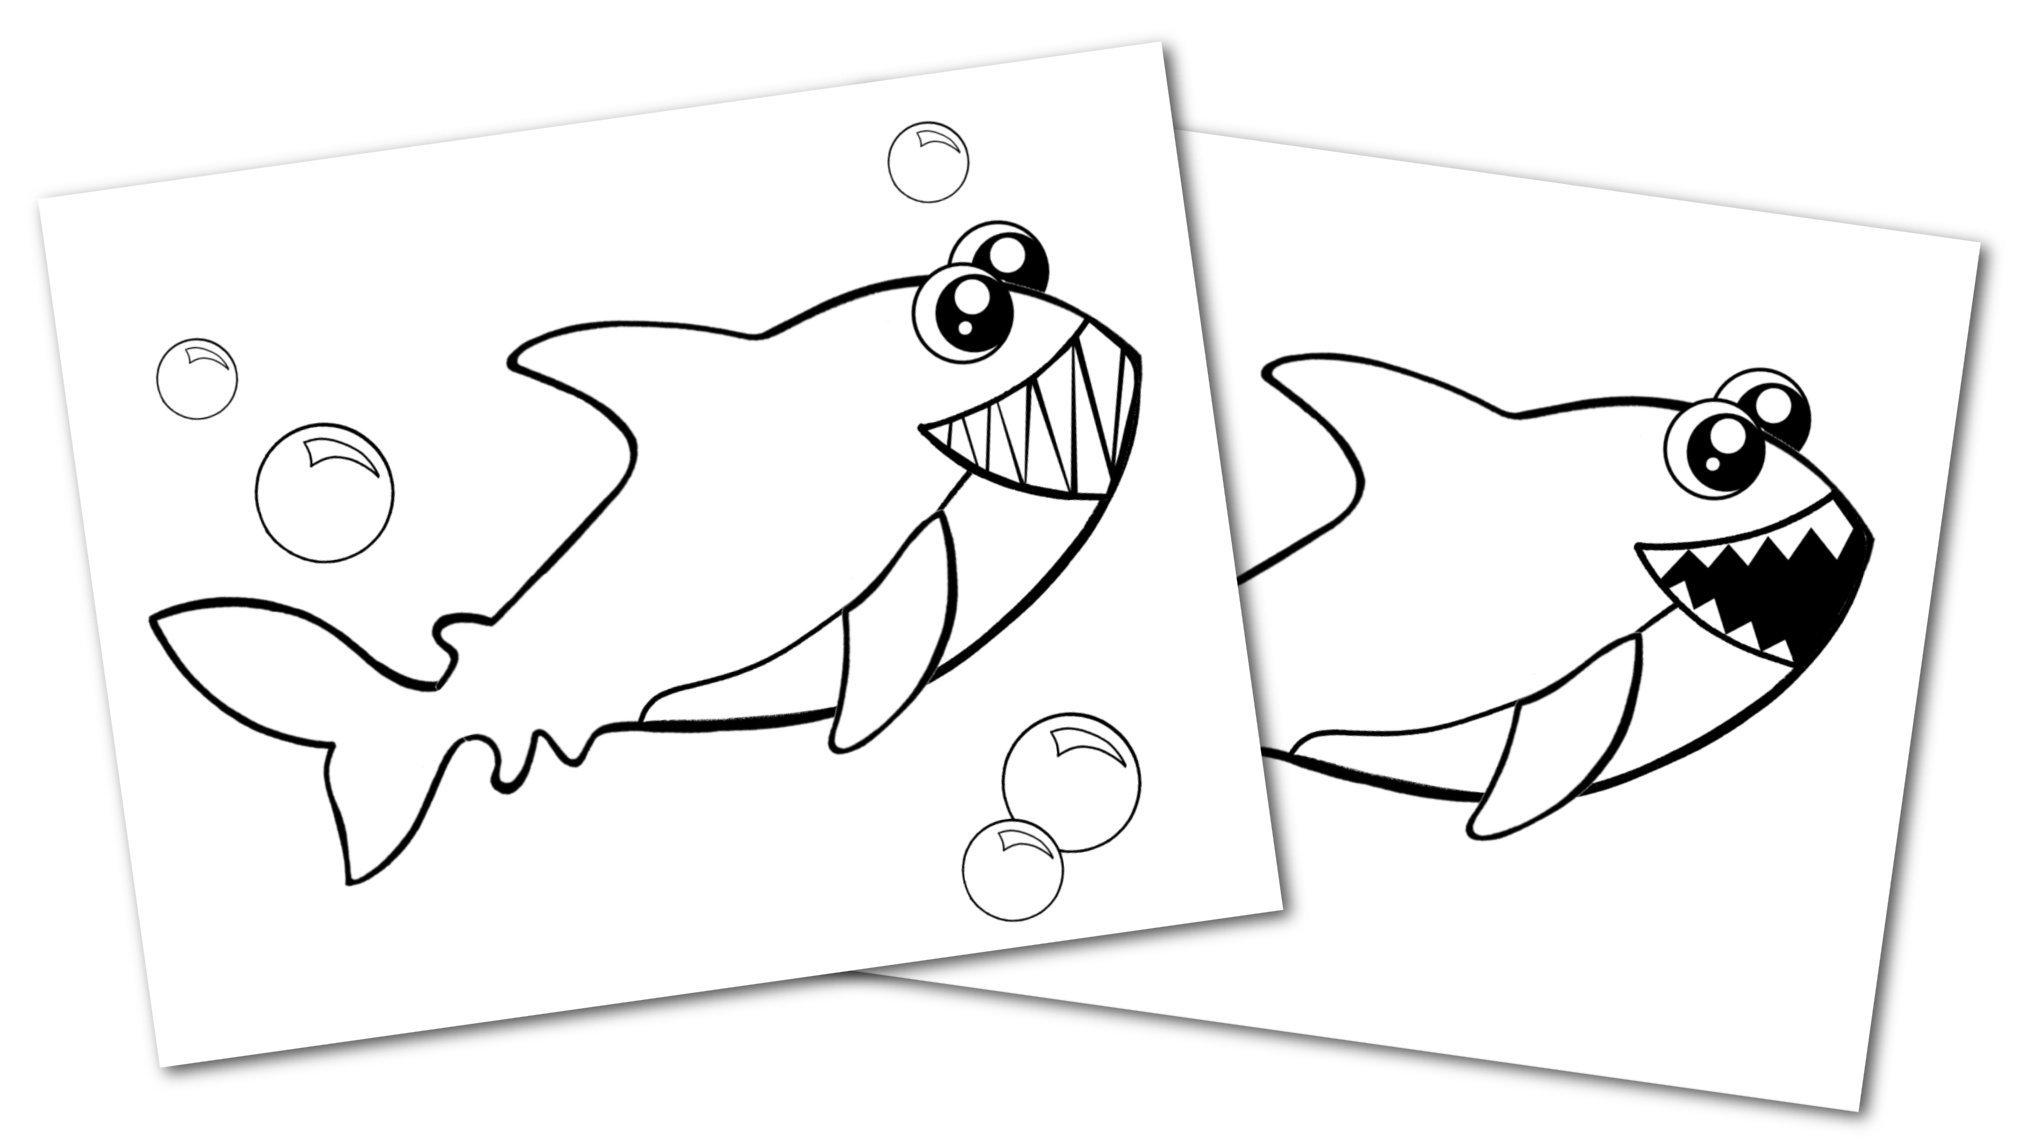 Free Printable Shark Ocean Animal Convertkit for Toddlers, Kids and Preschoolers